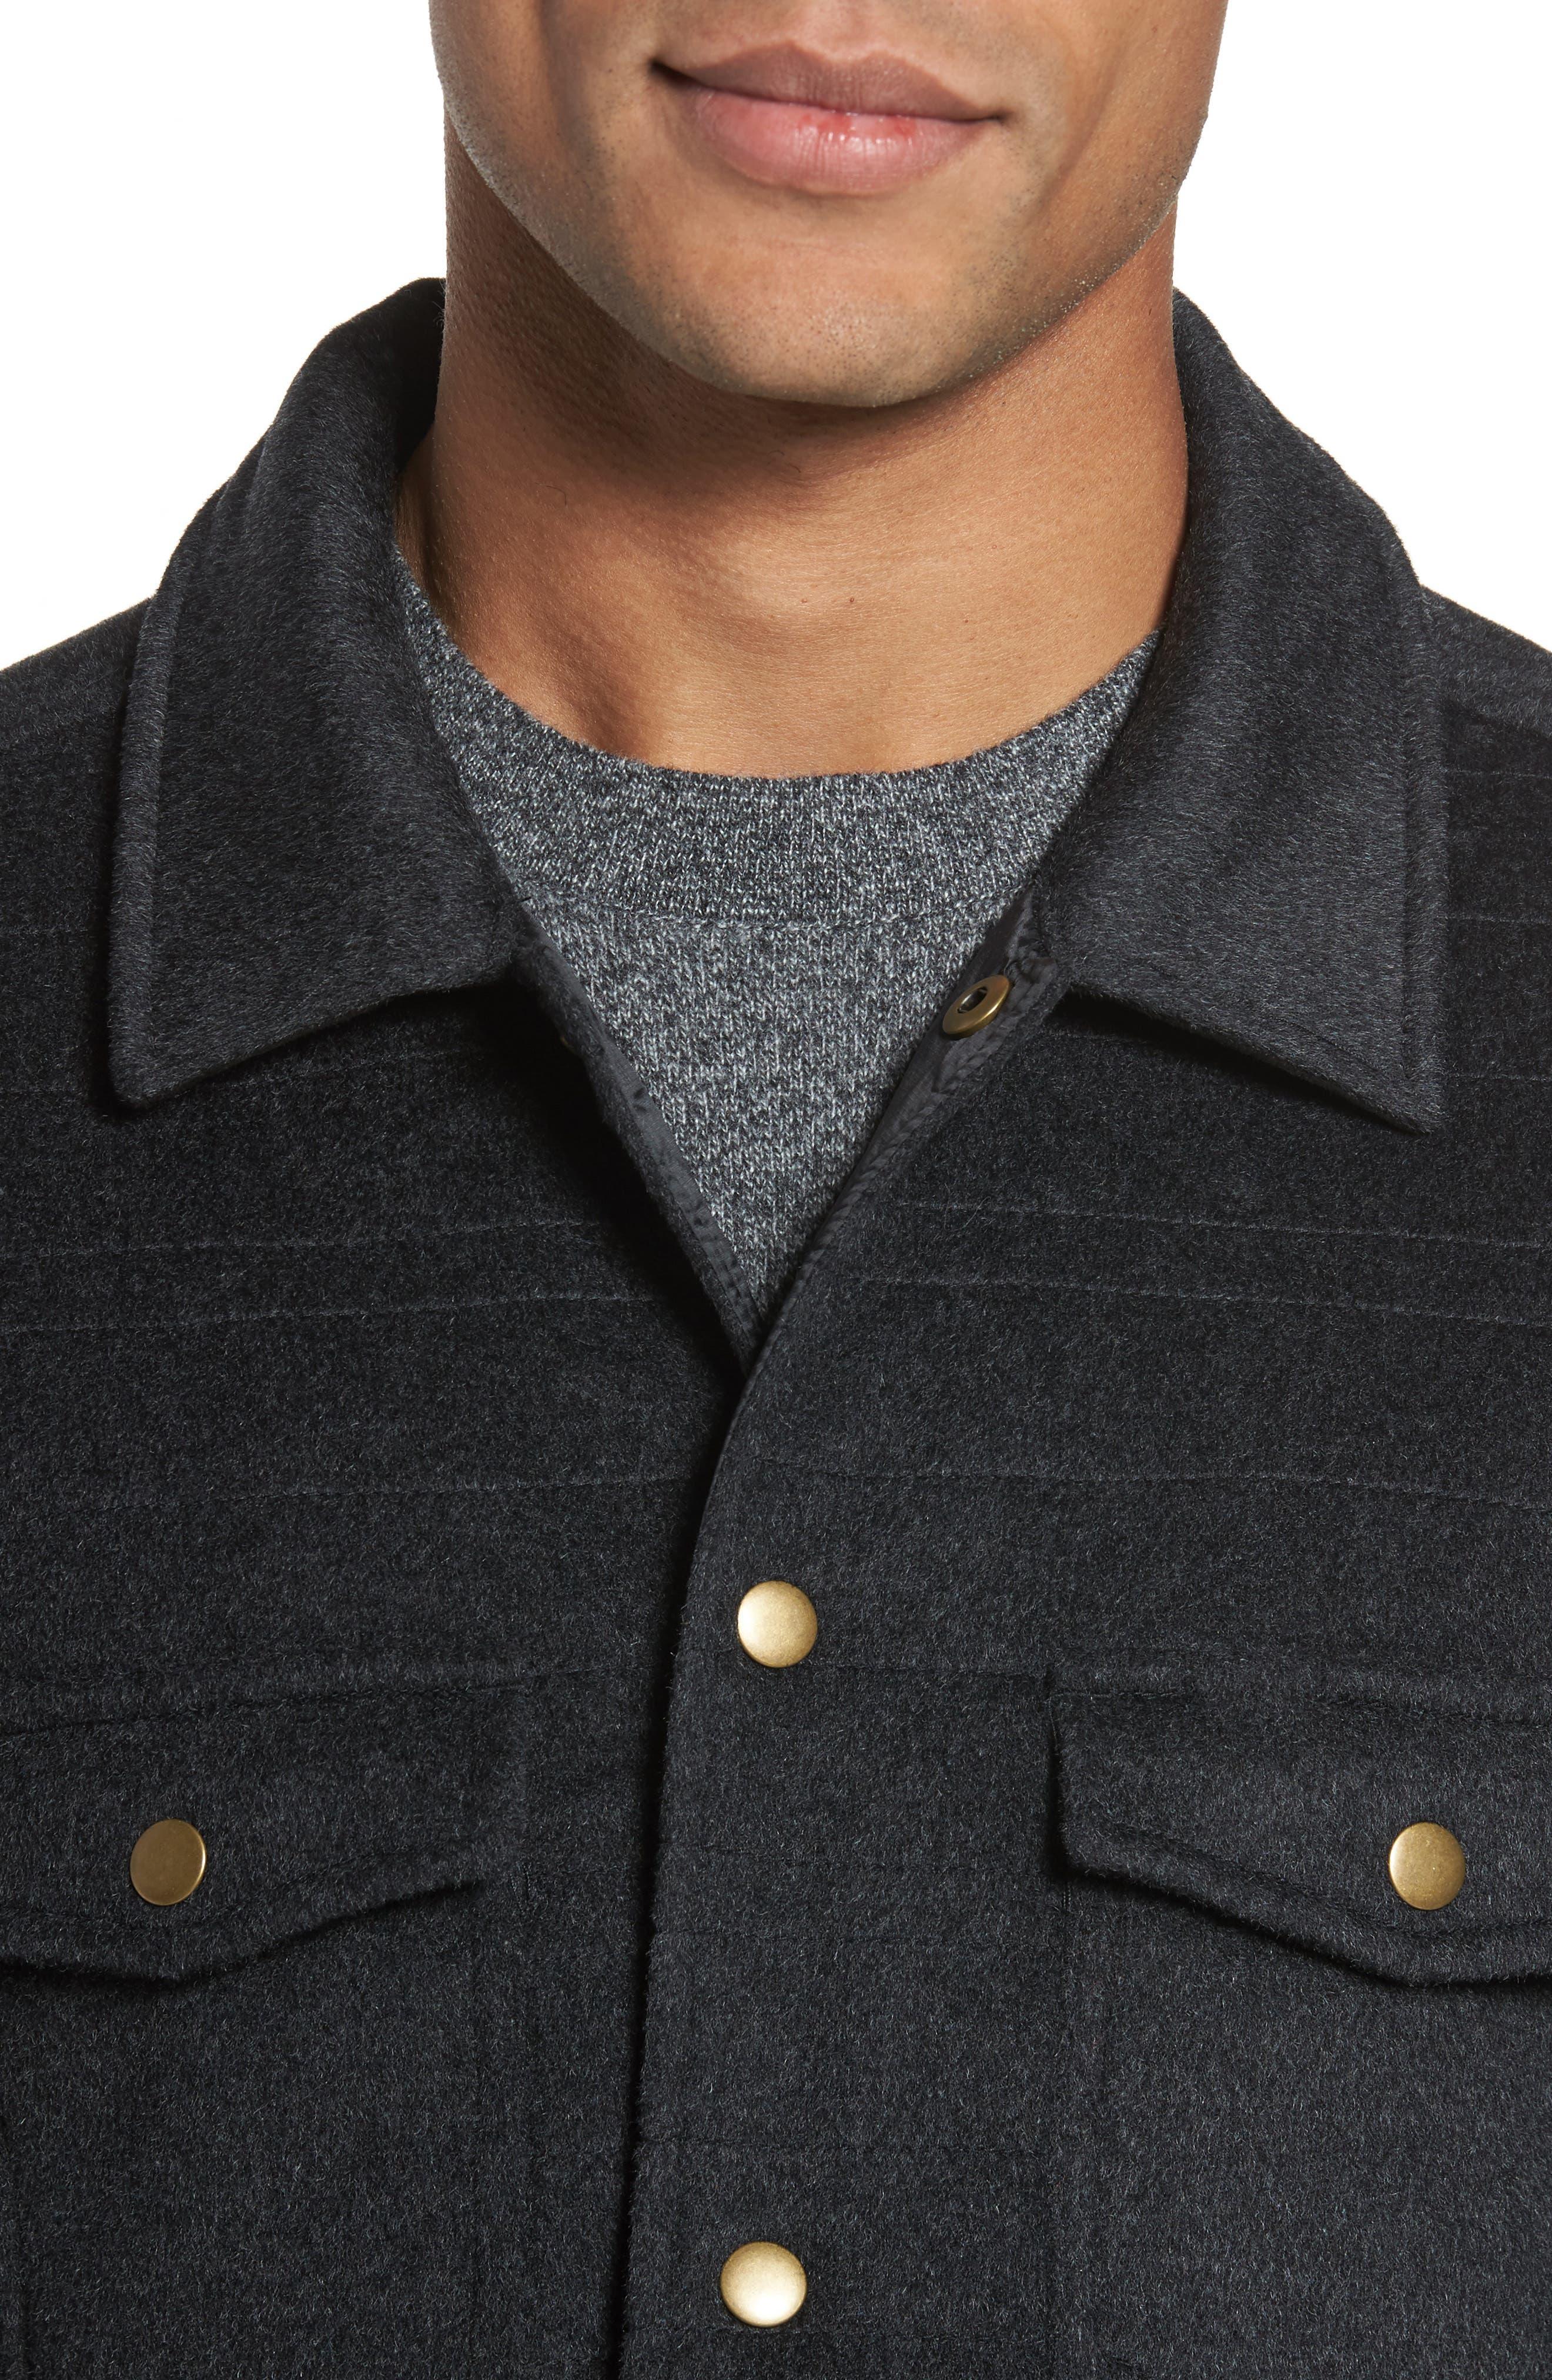 Michael Slim Fit Quilted Shirt Jacket,                             Alternate thumbnail 4, color,                             Dark Char Melange